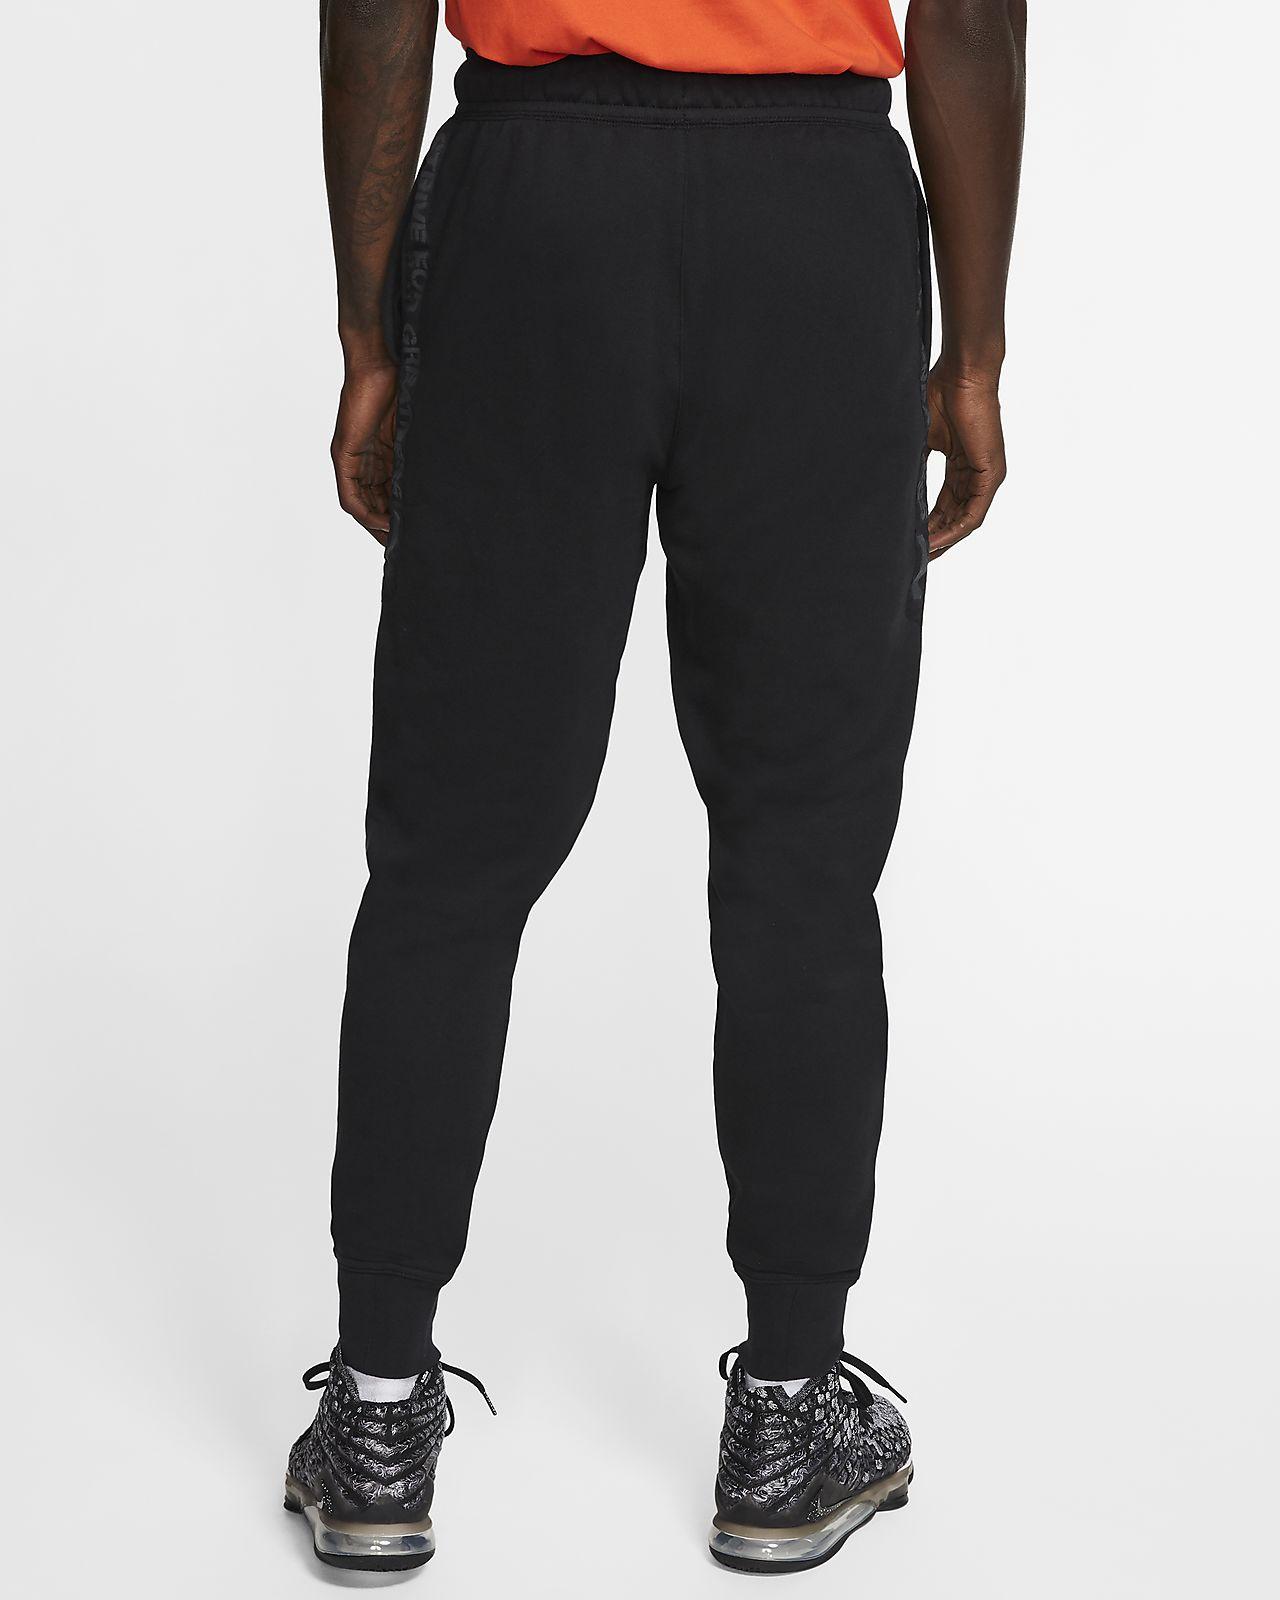 Pantaloni da basket LeBron Uomo. Nike IT